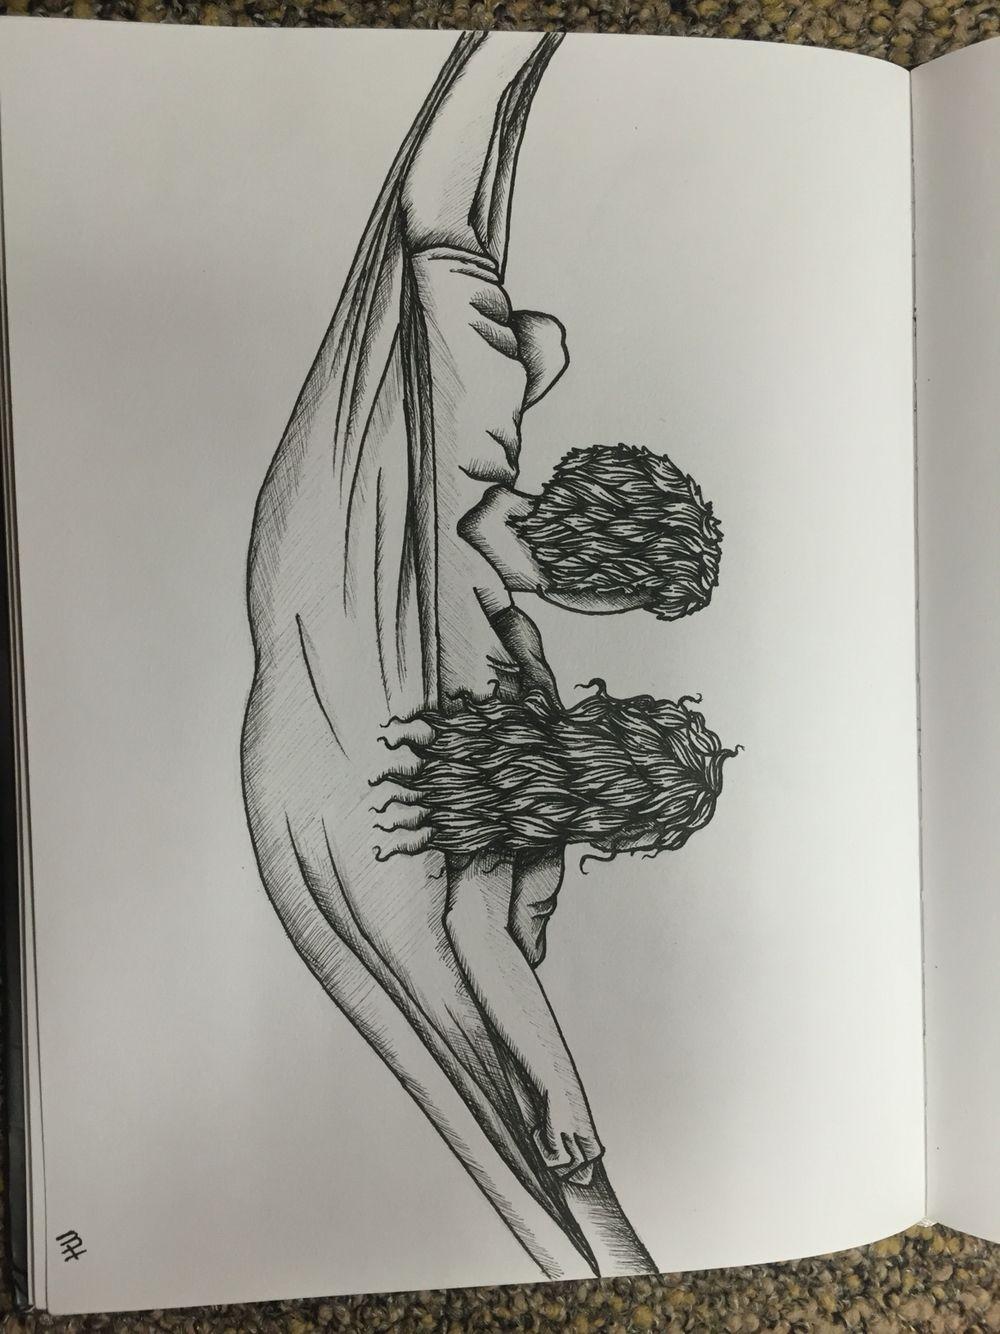 Couple eno hammock drawing in pen